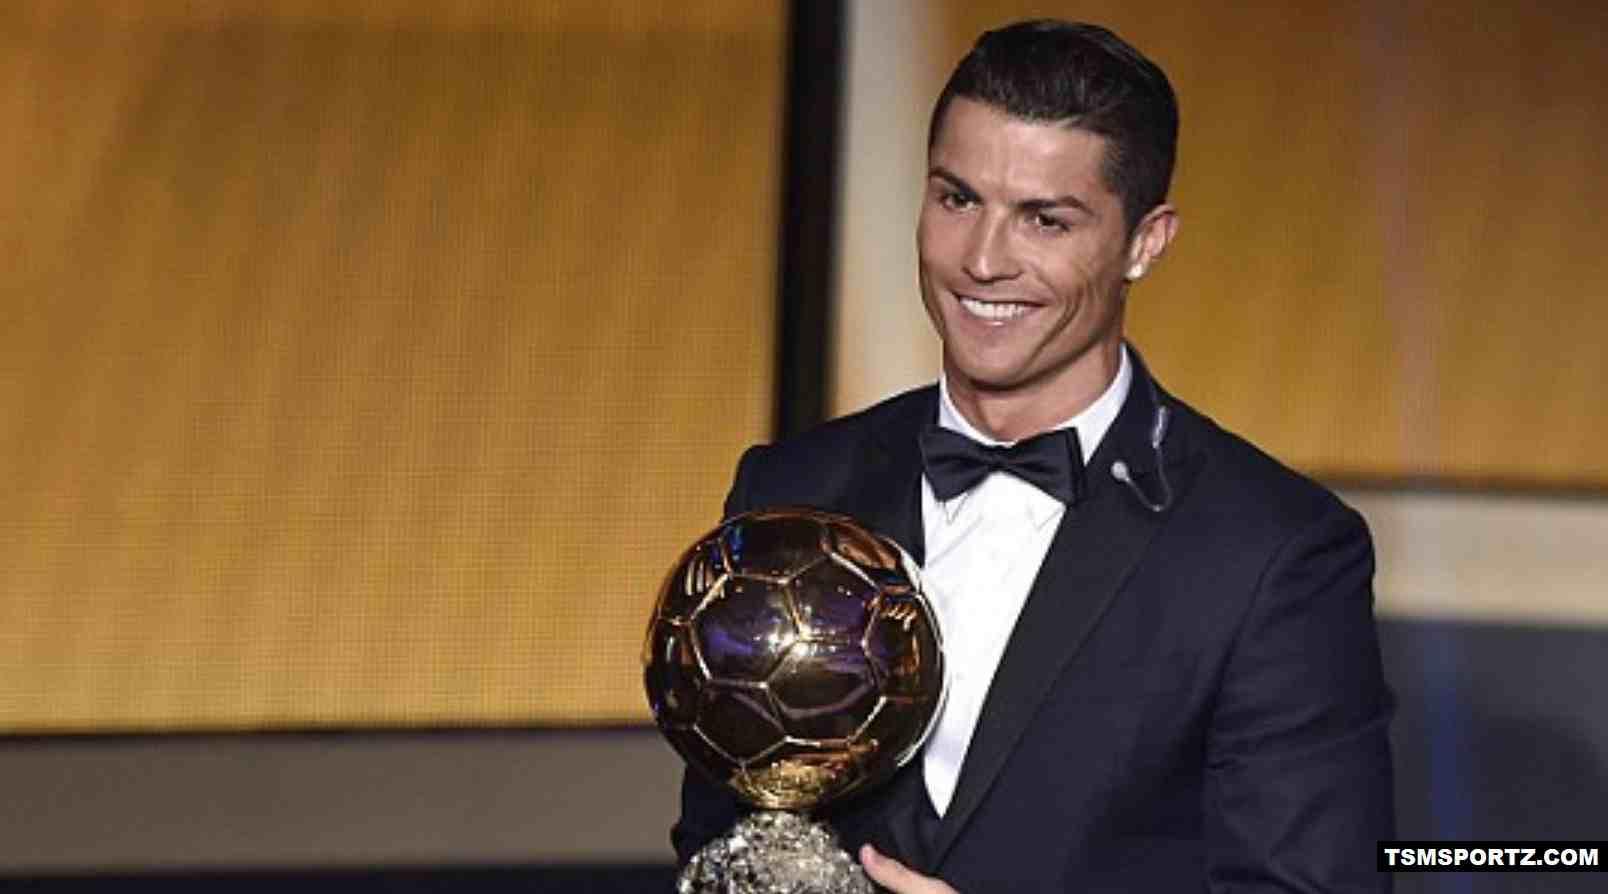 Cristiano Ronaldo wins Fifa ballond dor award 2017